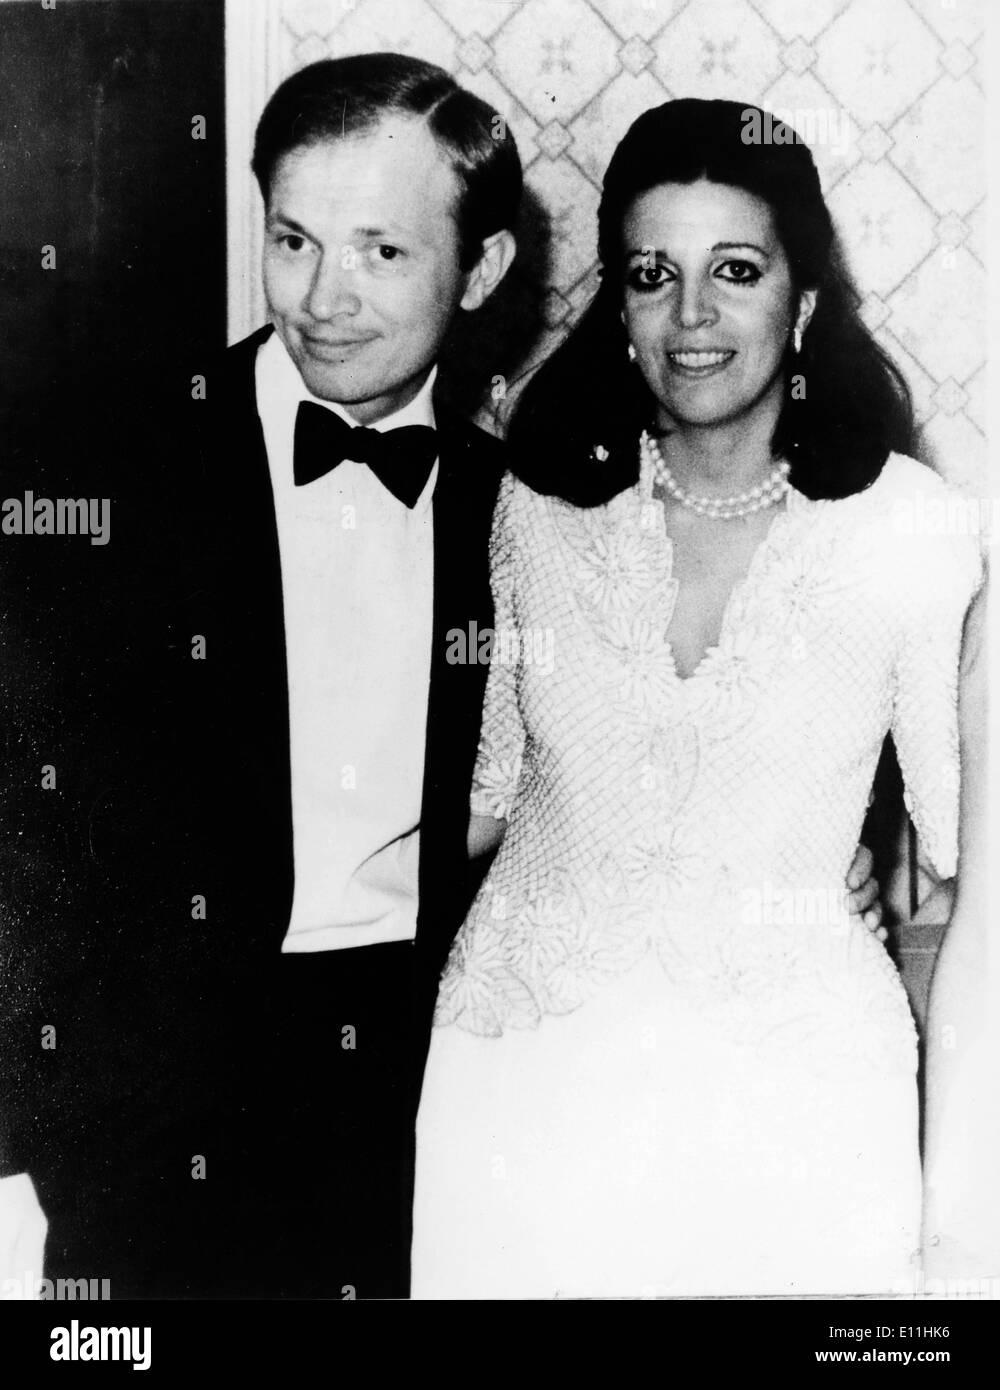 Christina Onassis at party with husband Sergei Kauzov - Stock Image